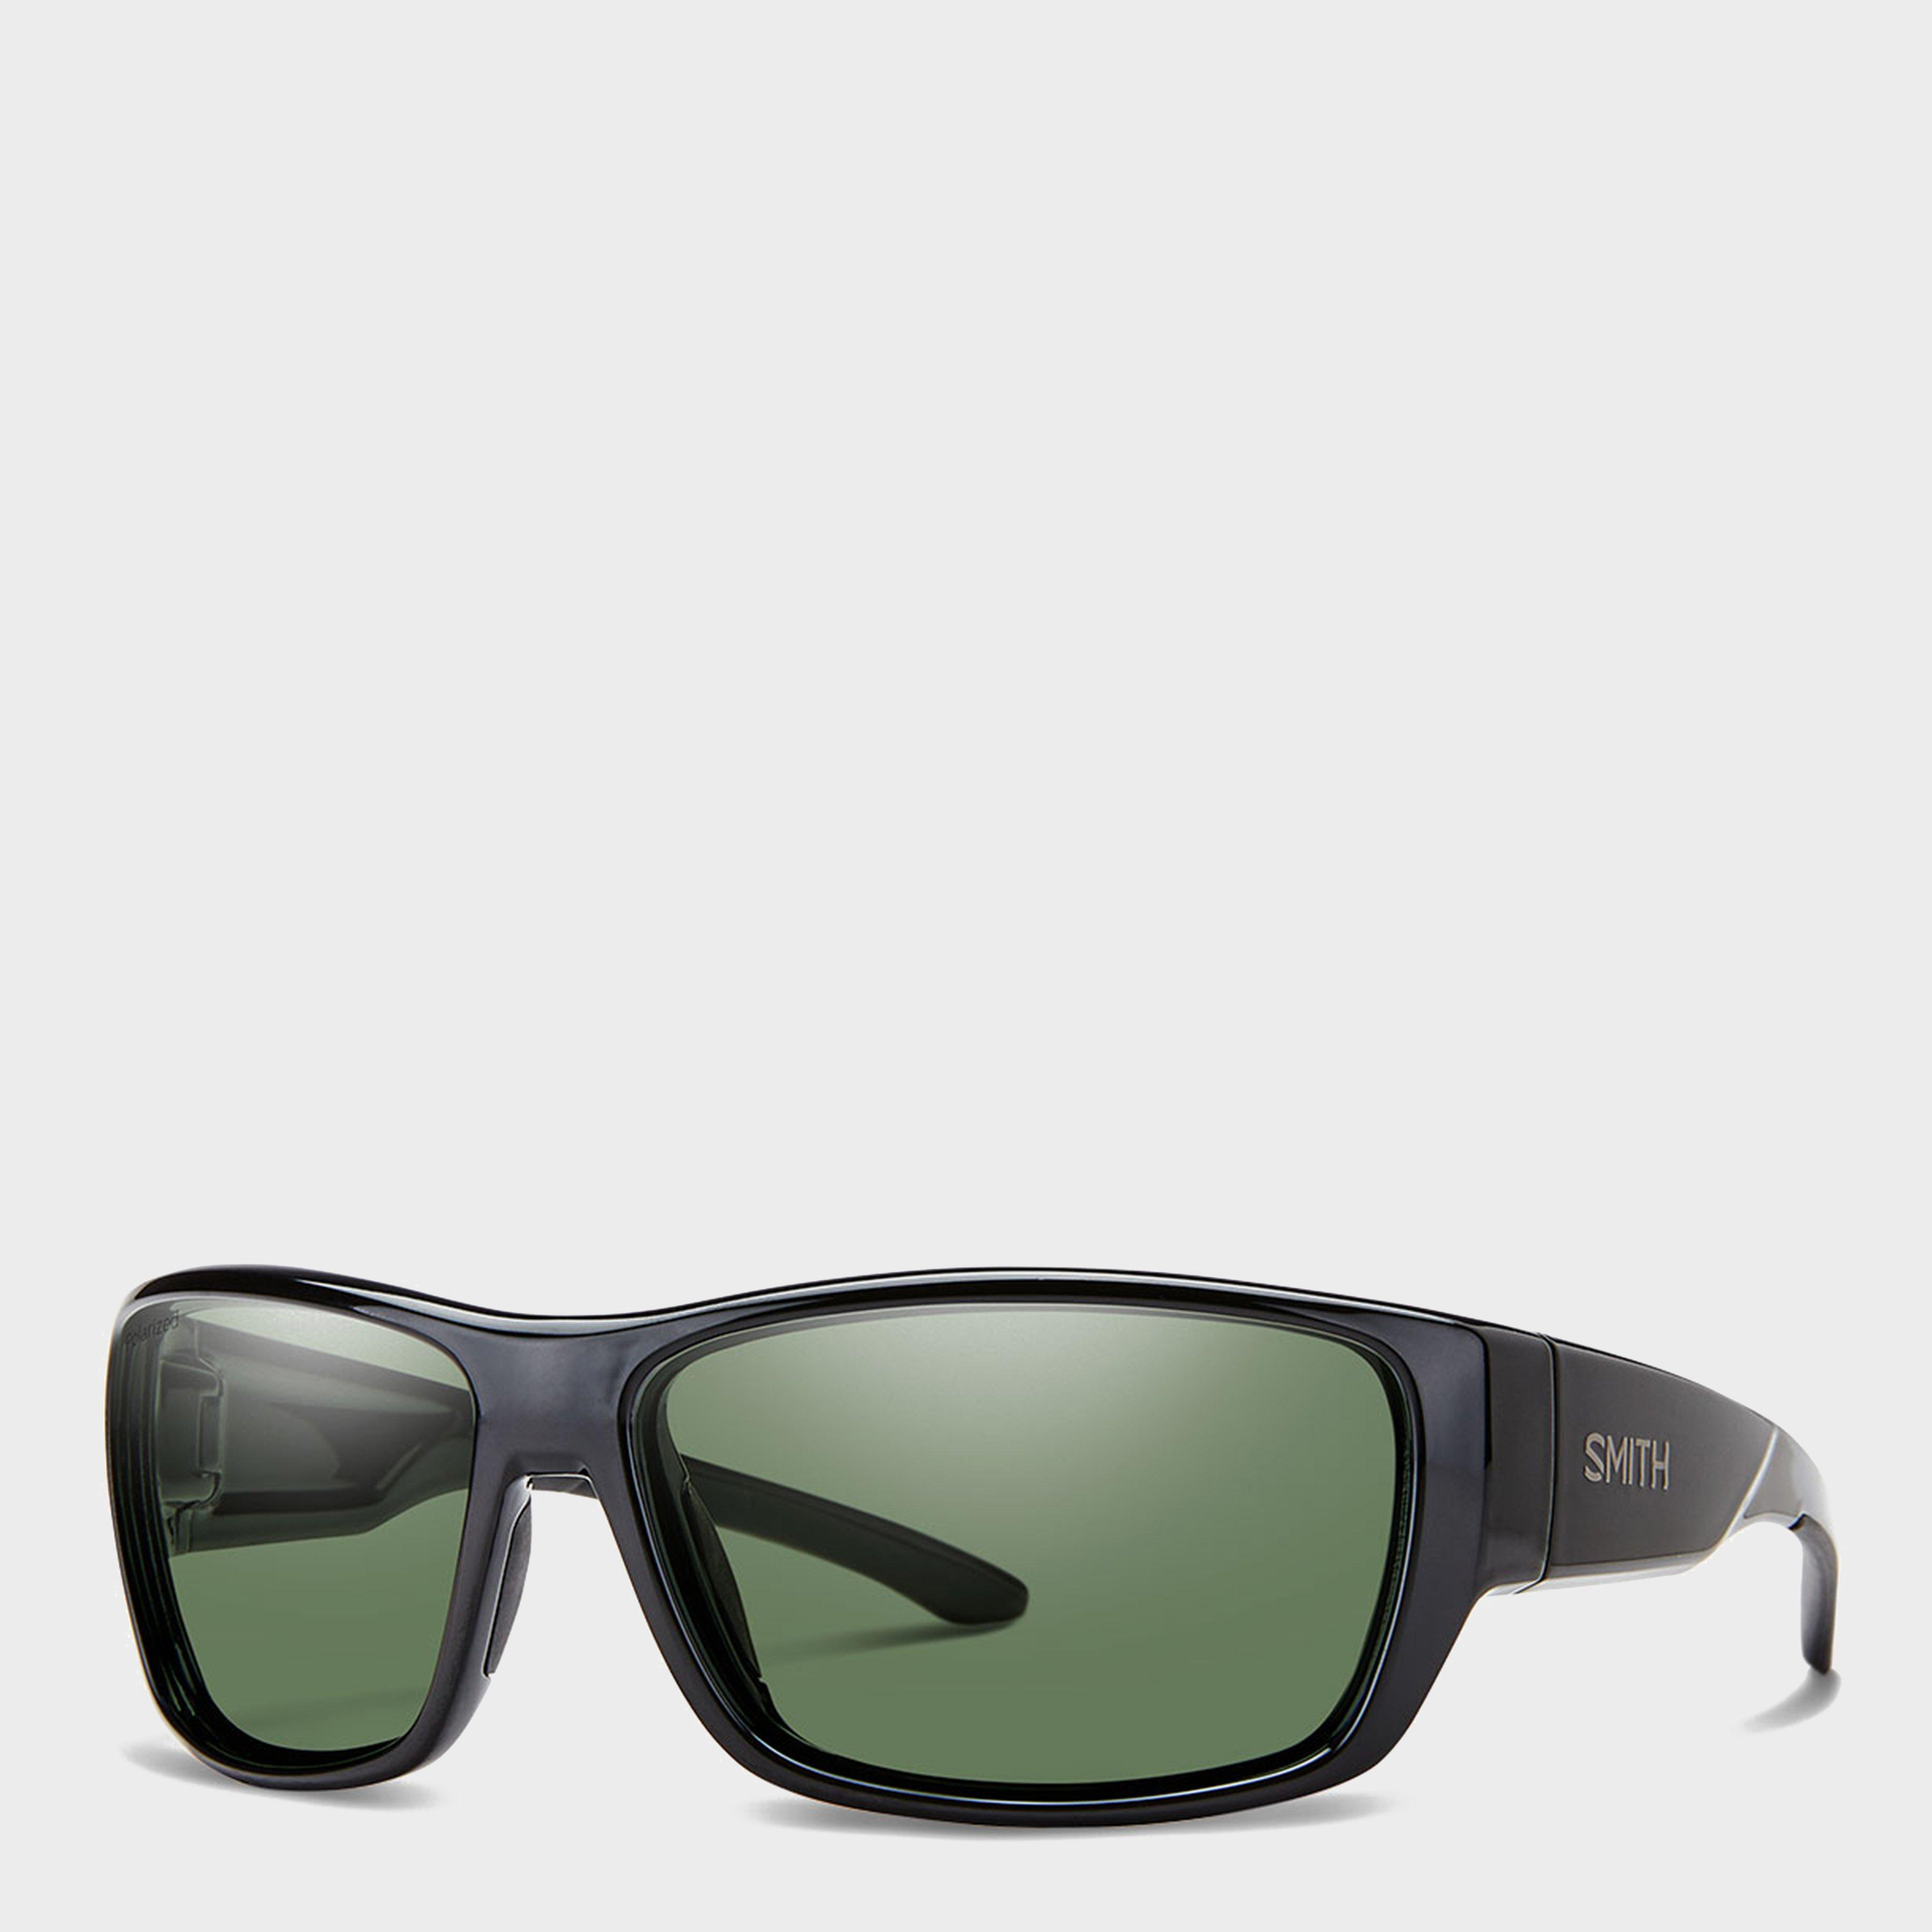 Smith Lowdown Slim 2 Sunglasses, Brown